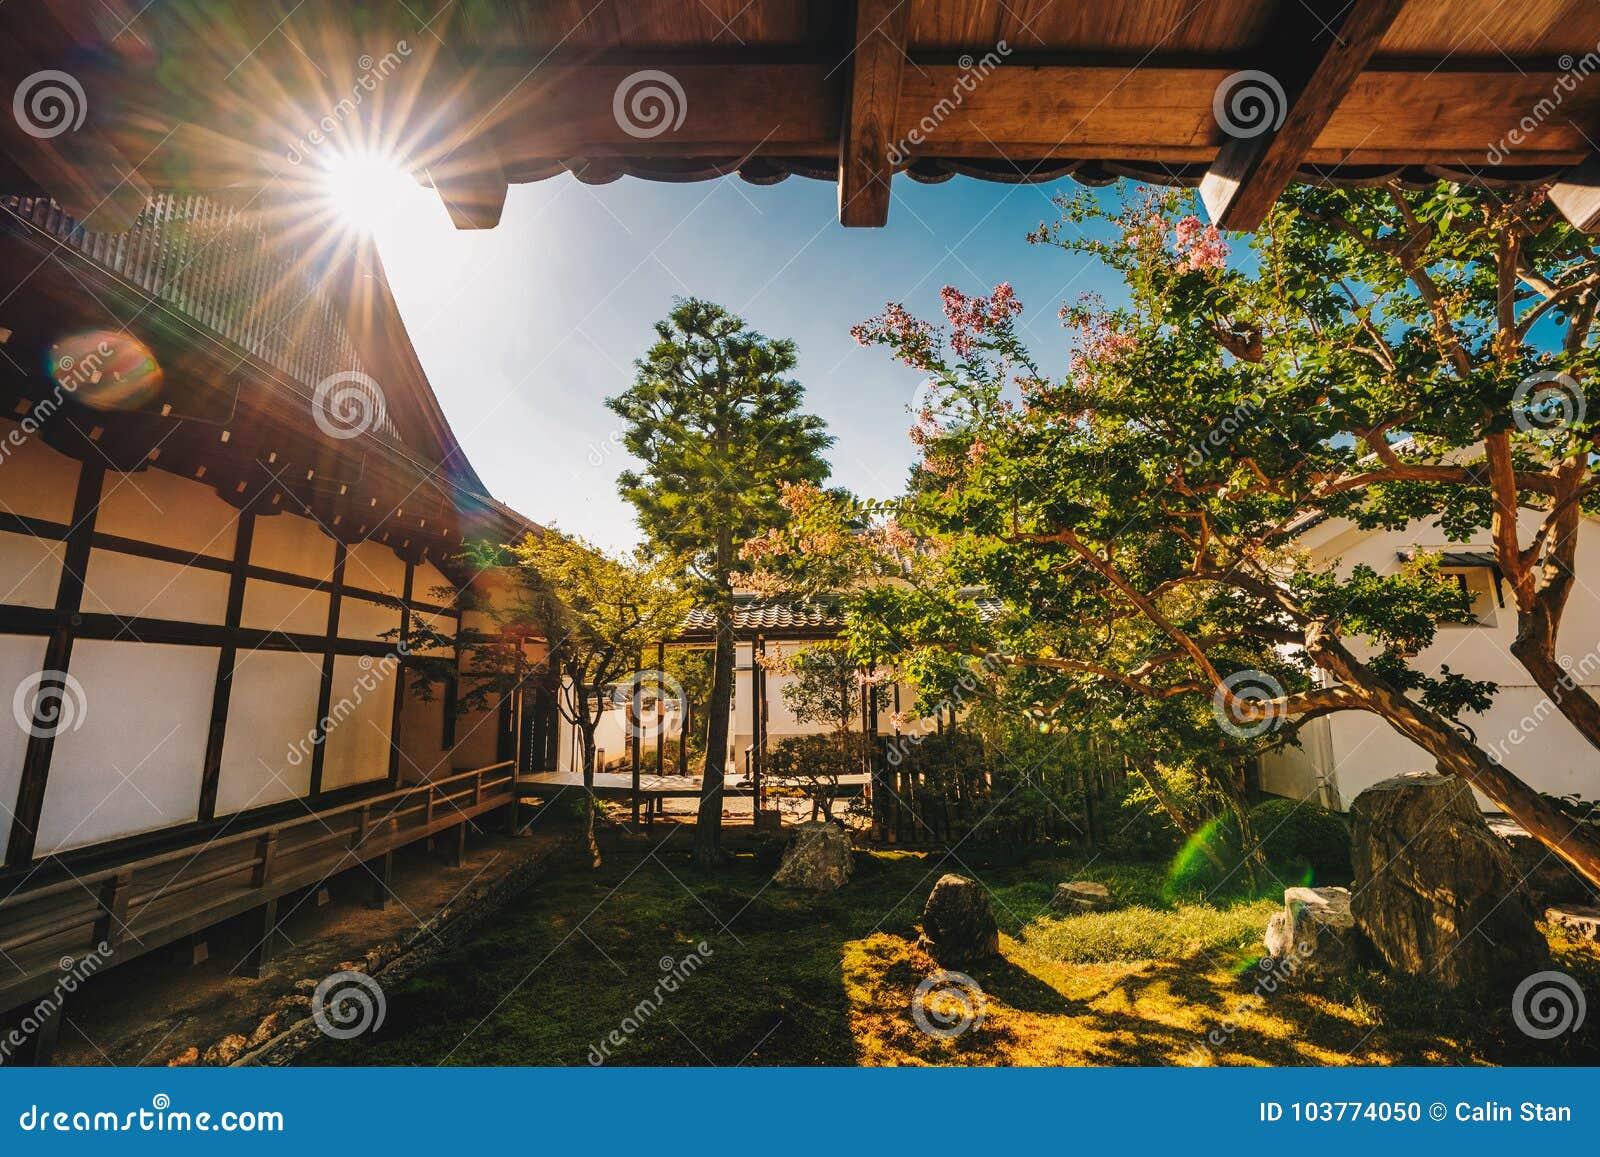 Japanese Temple Zen Garden In Kyoto, Japan. Artistic Interpretat ...